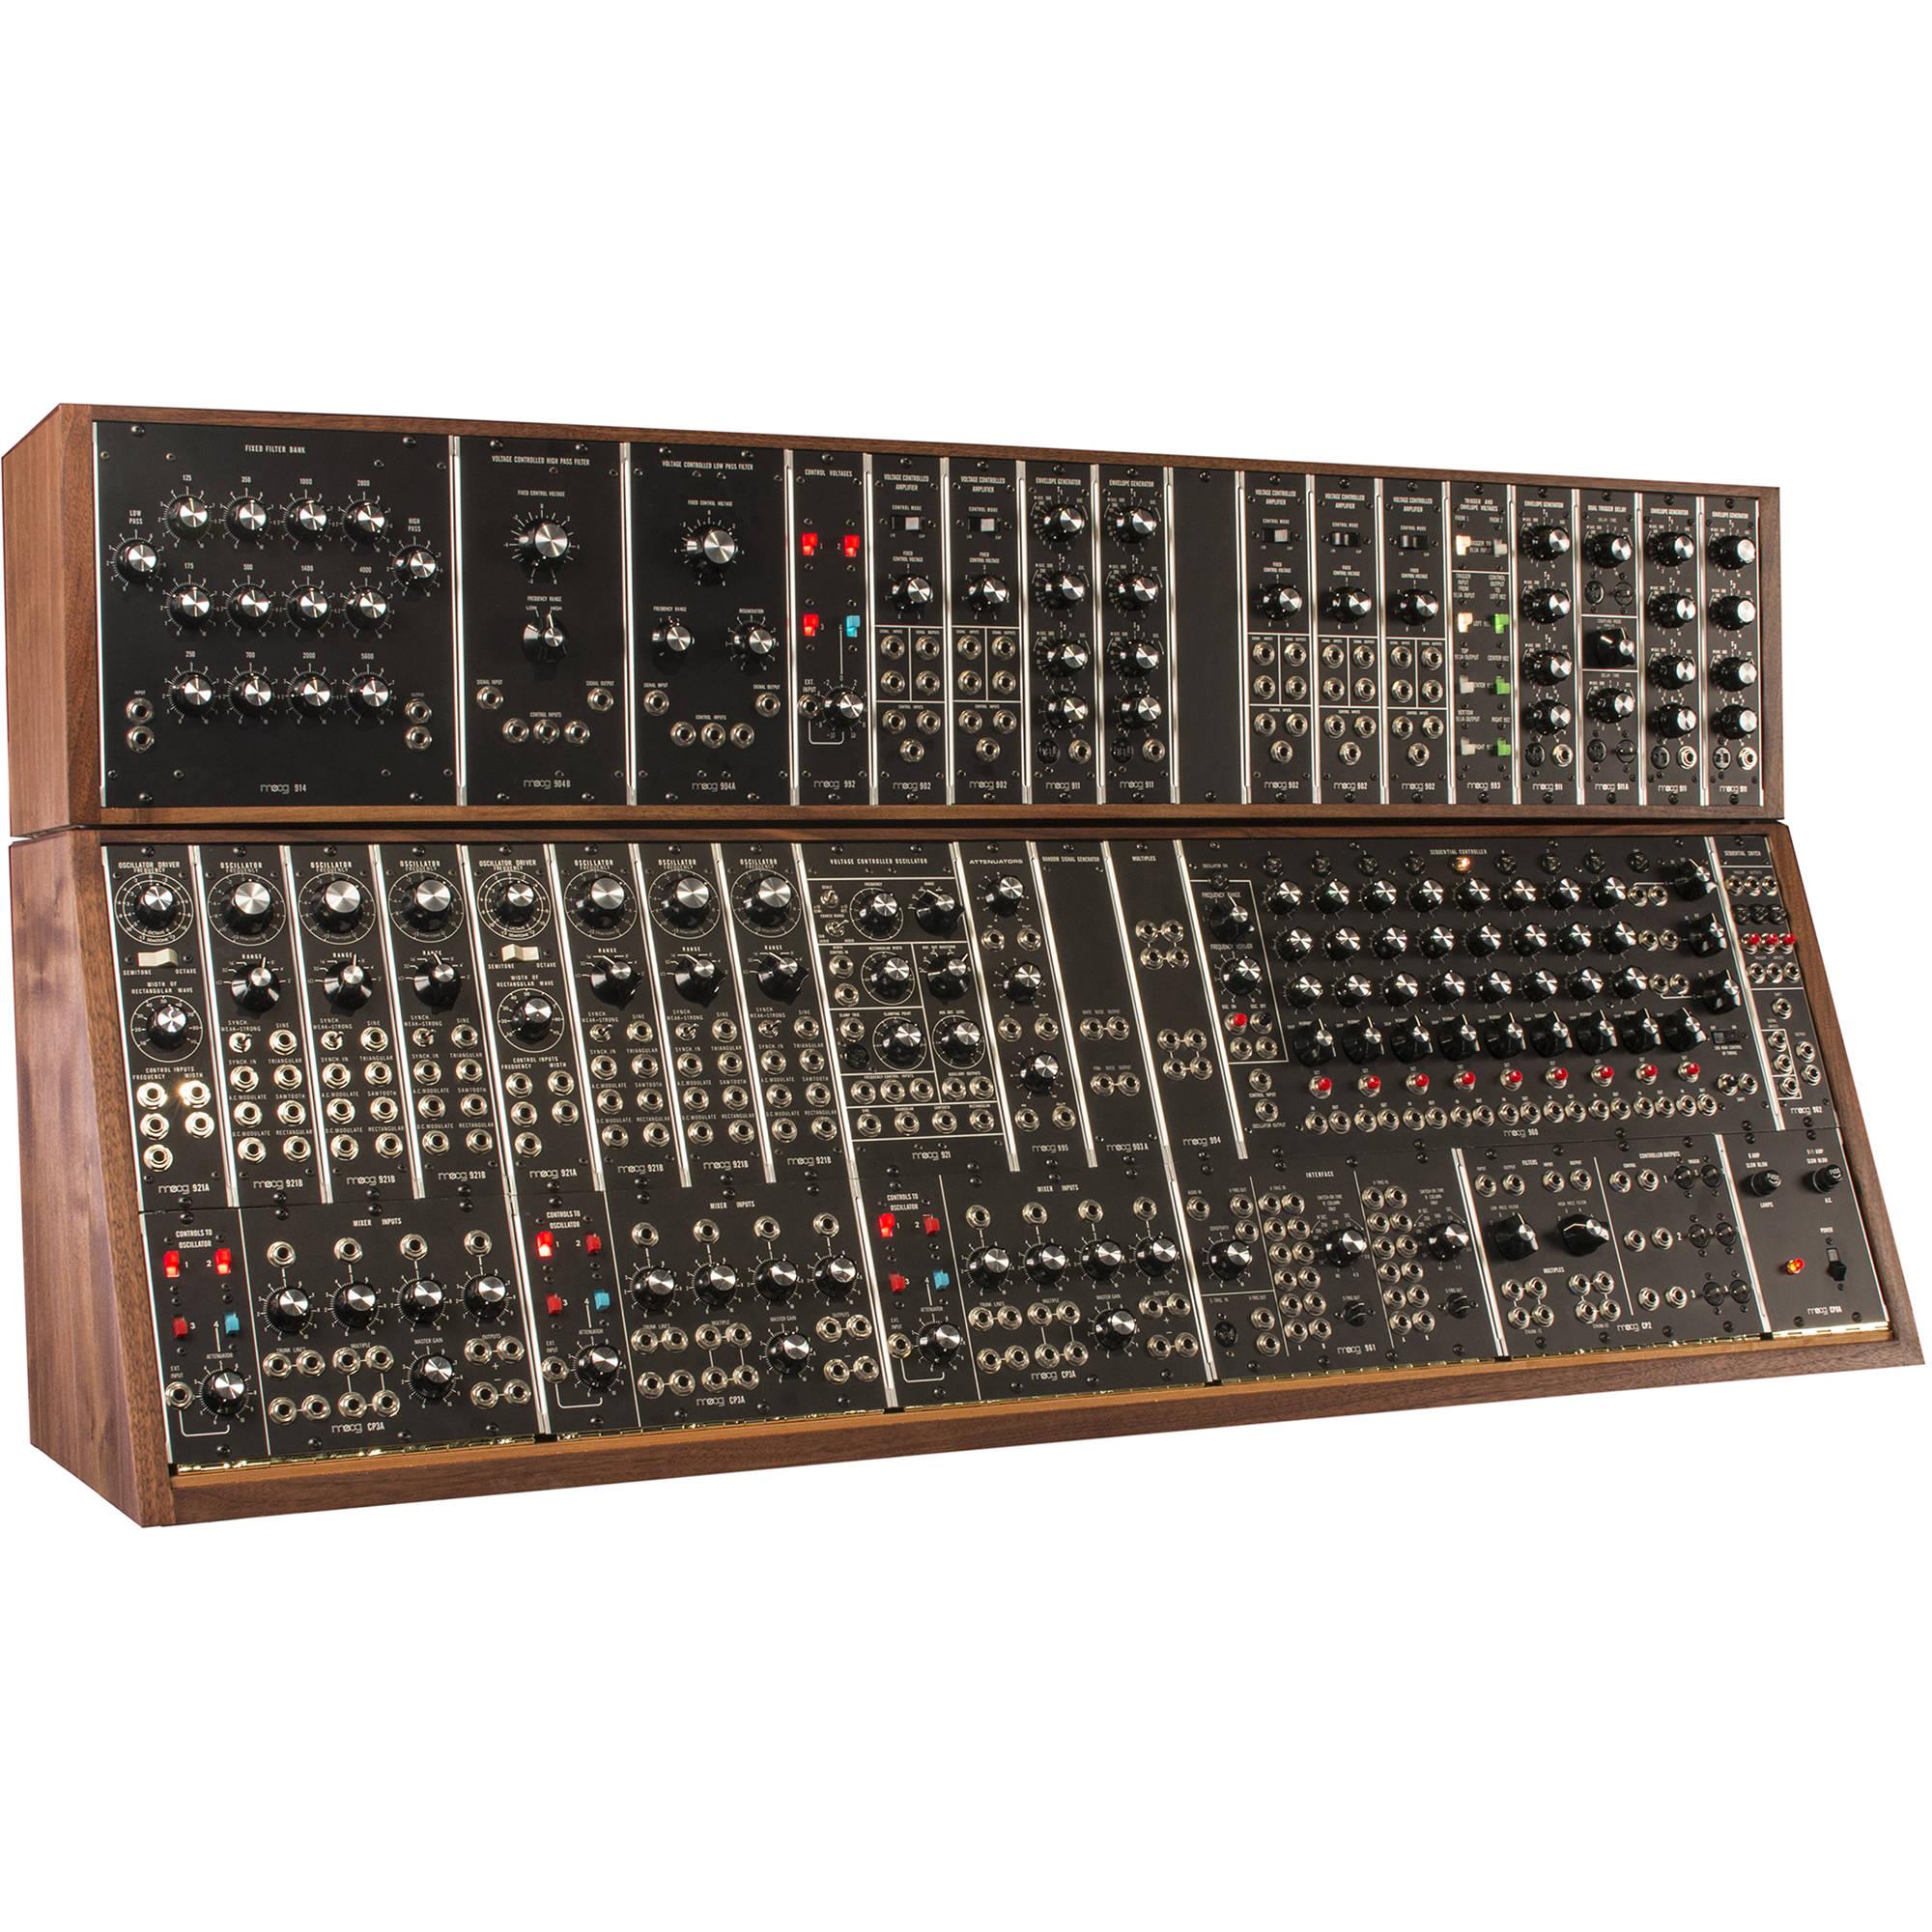 moog modular system 55 synthesizer mod sys 55 01 01 b h photo. Black Bedroom Furniture Sets. Home Design Ideas